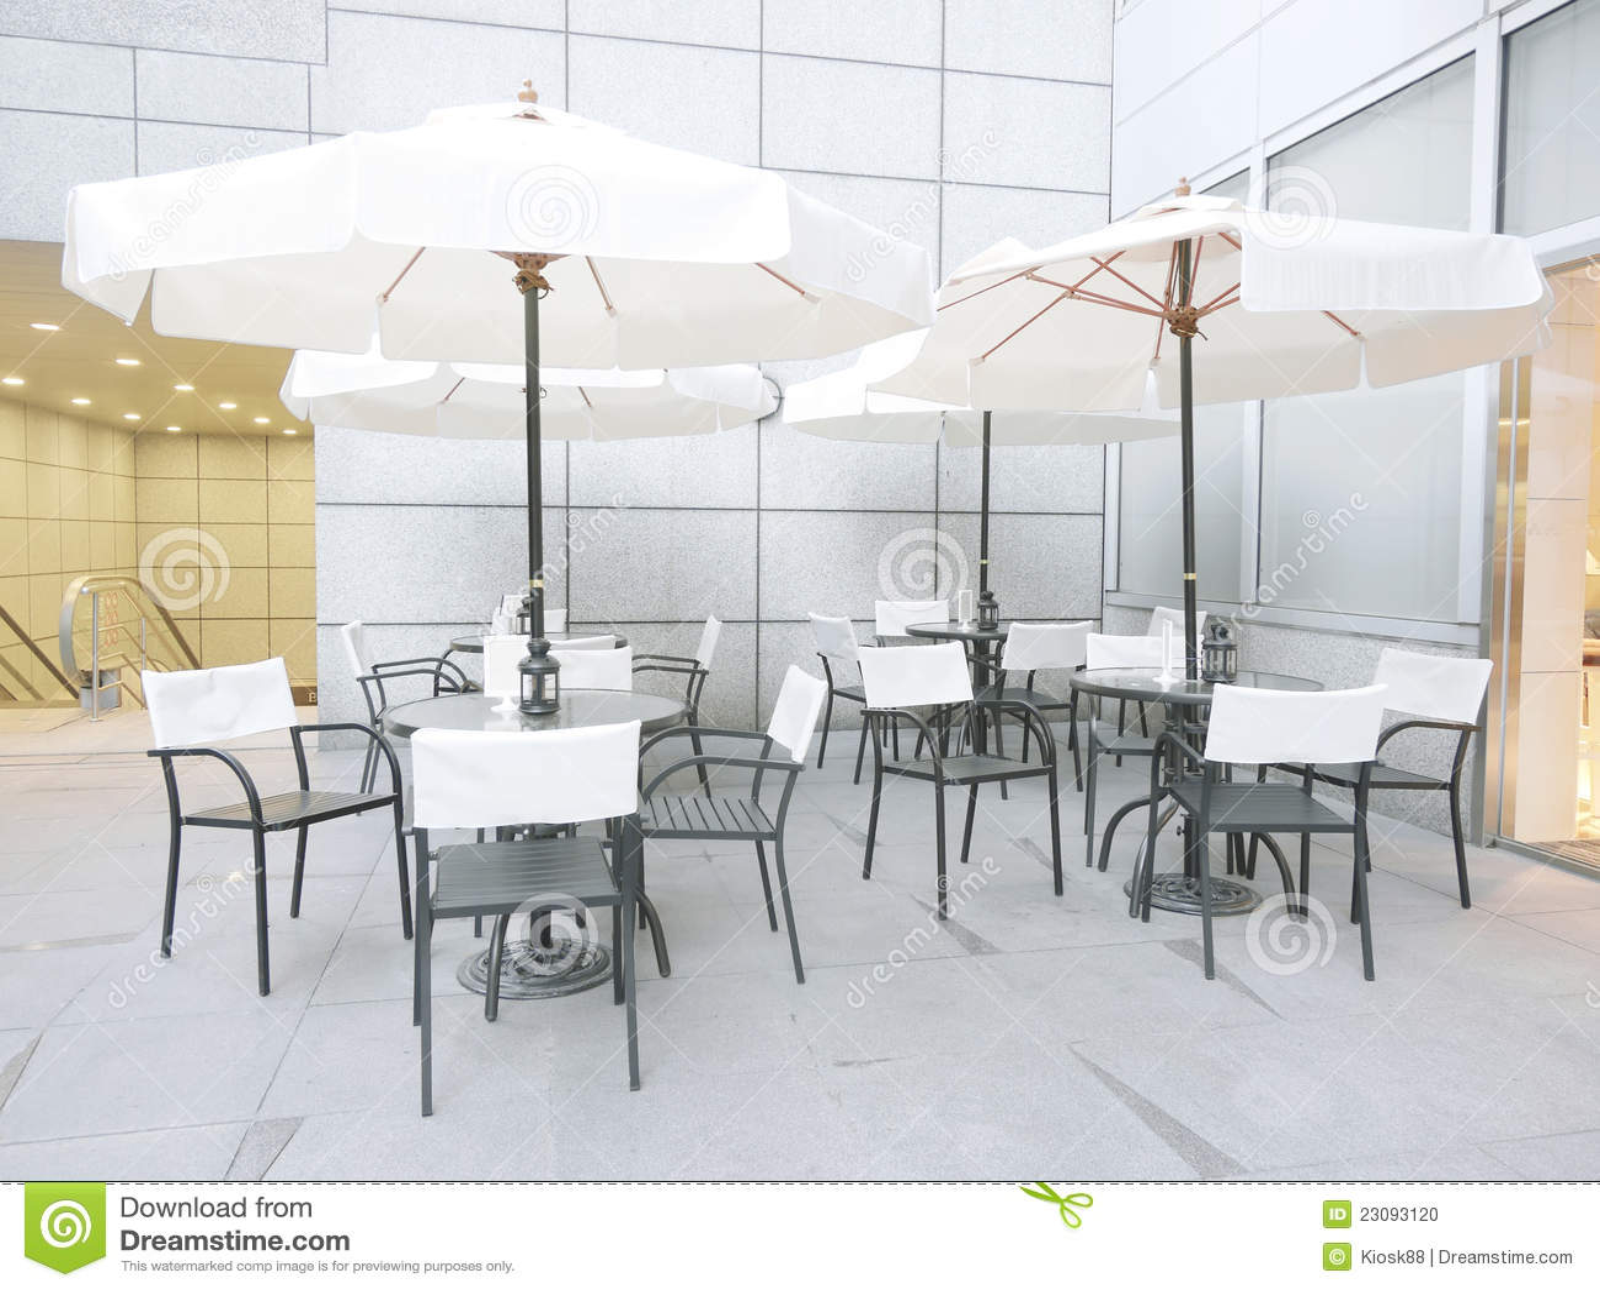 Outdoor Coffee Shop Stock Photo Image 23093120